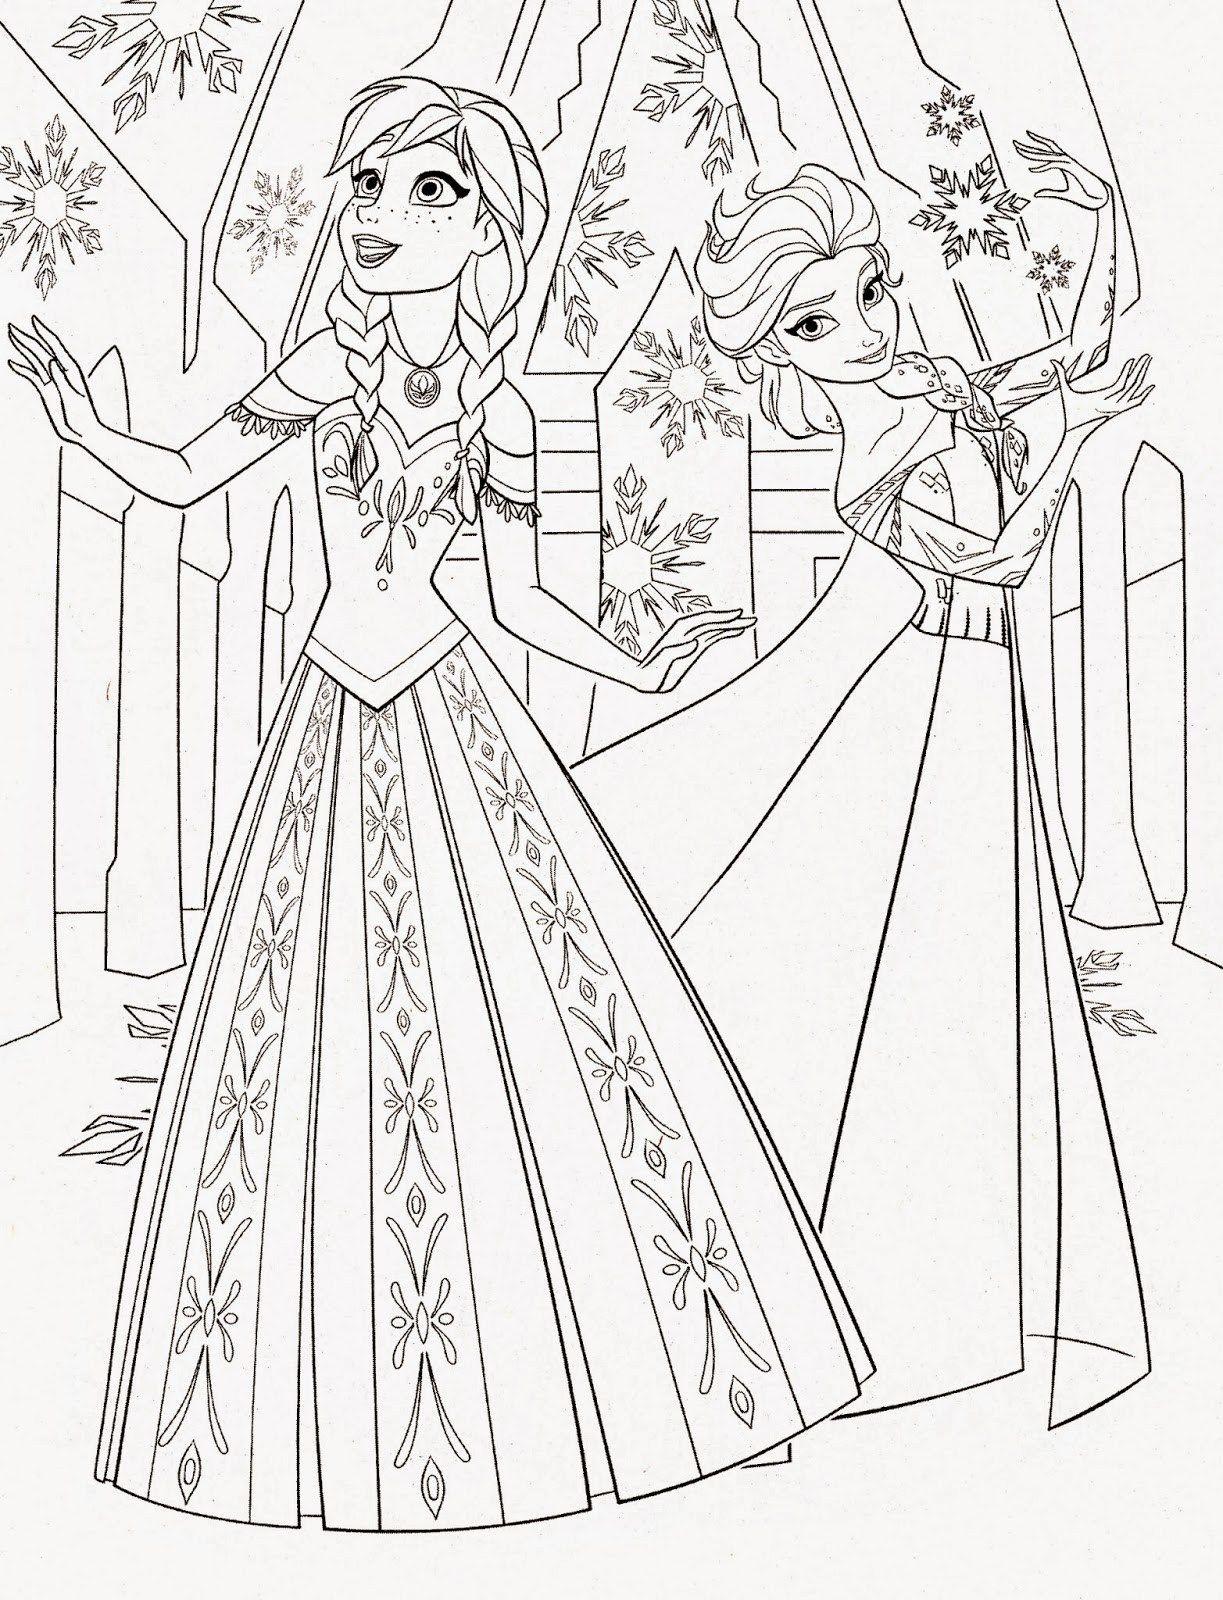 Anna Und Elsa Zum Ausmalen Neu Anna Elsa Ausmalbilder Best Disney Princess Frozen Elsa and Anna Bild